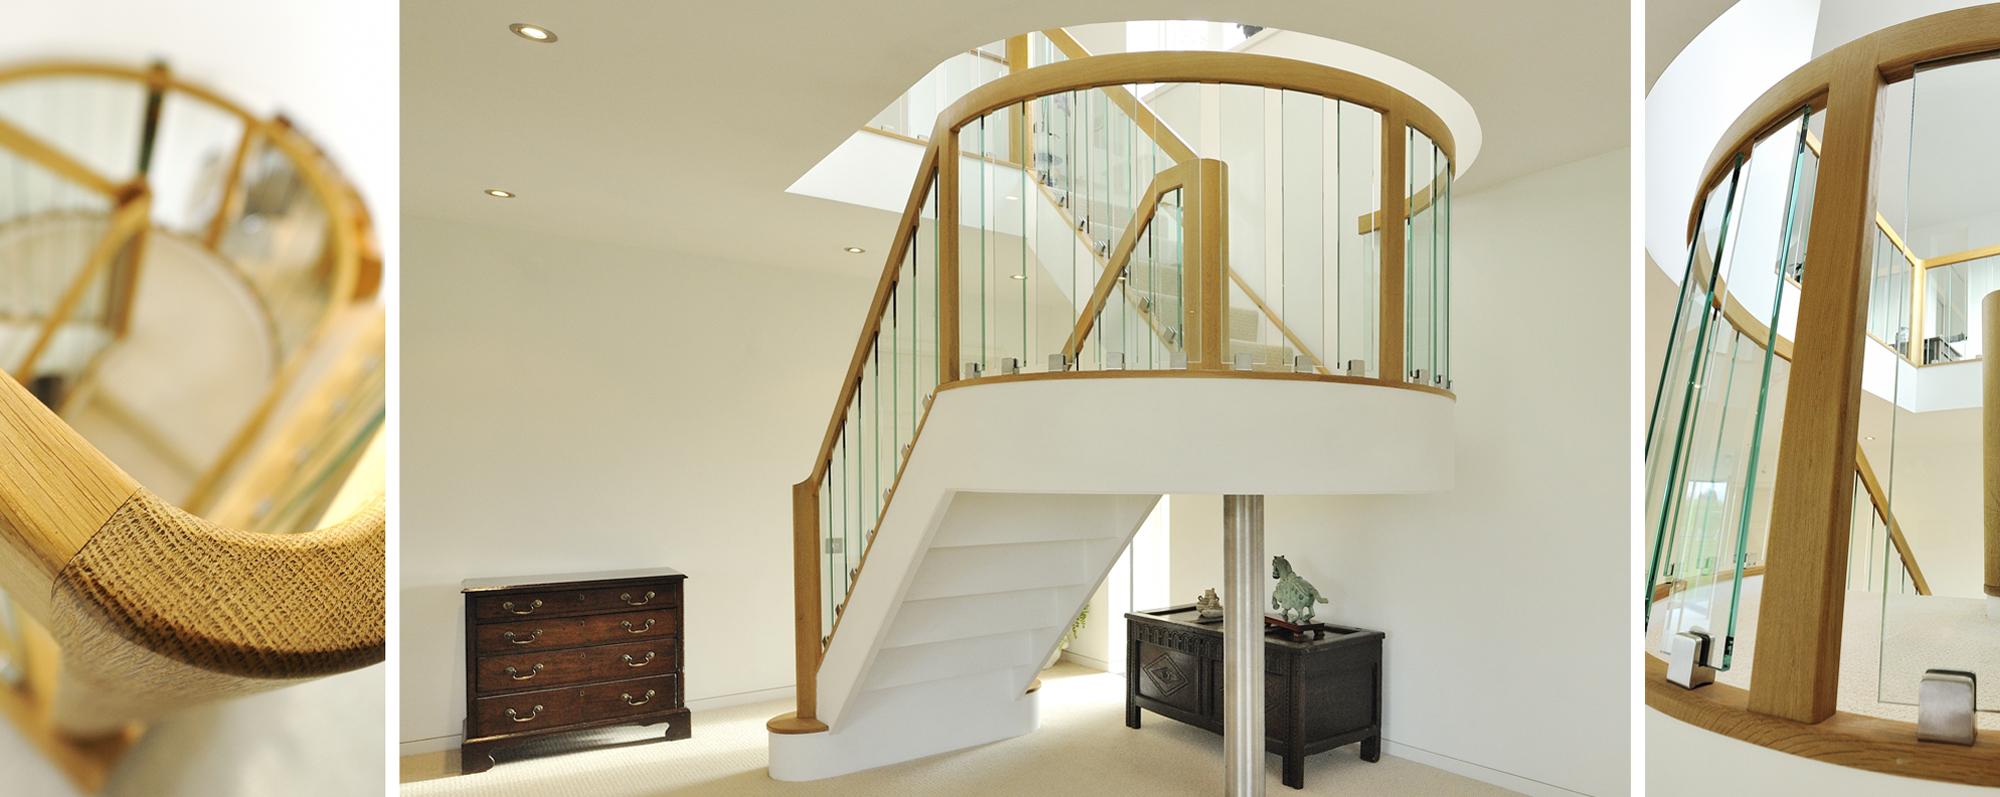 Luxury Staircase design